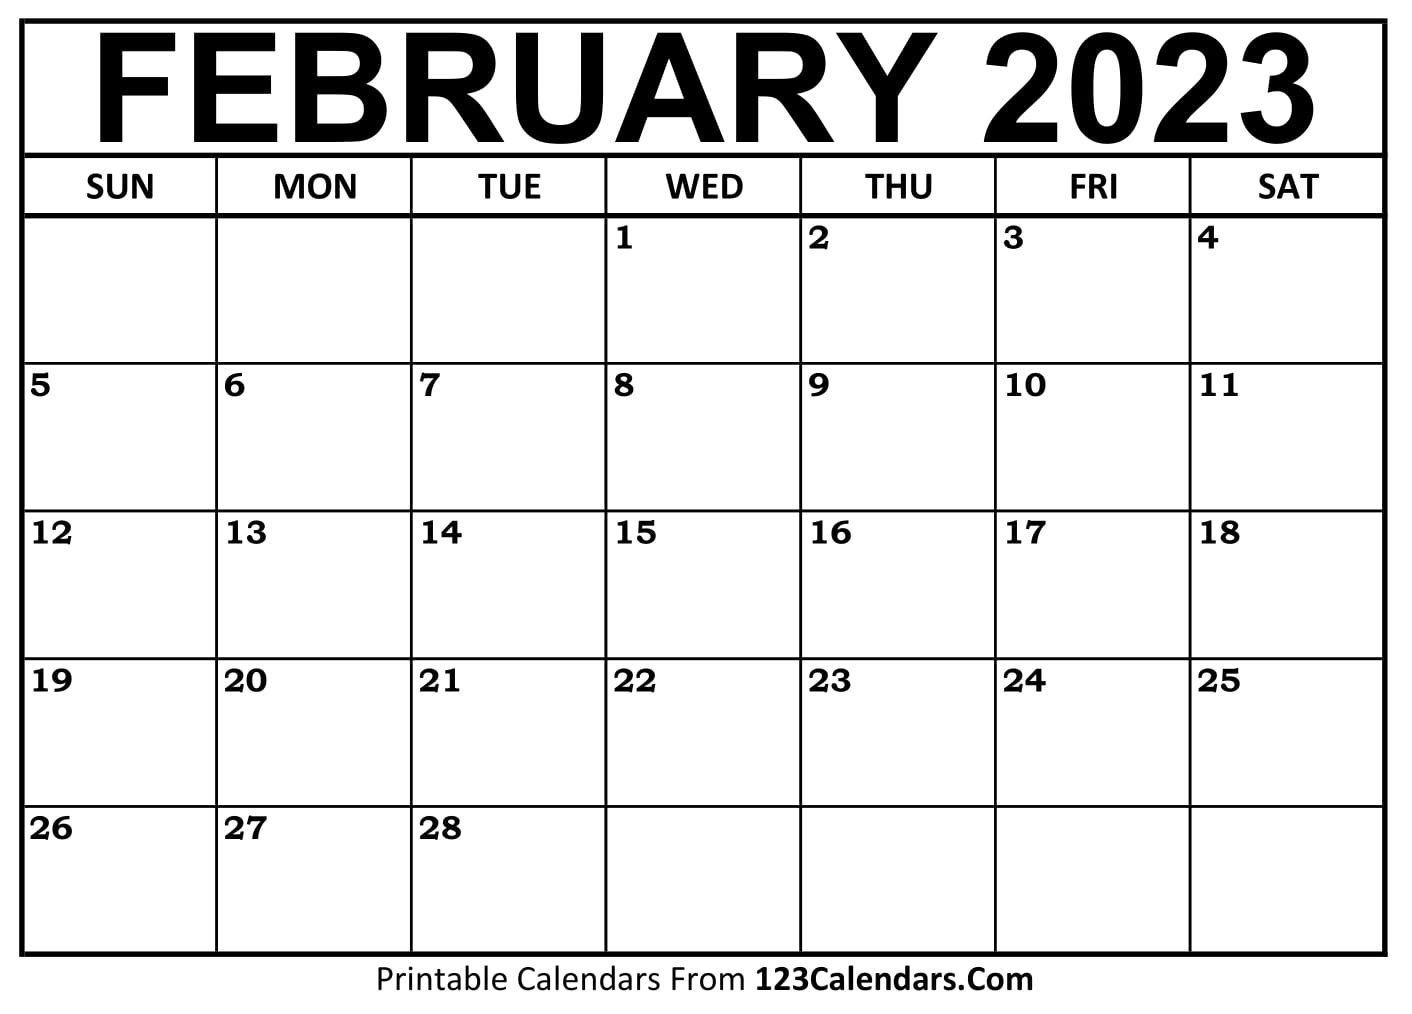 Printable February 2021 Calendar Templates   123Calendars for Free Calendars You Can Edit 2021 8 1/2 X 11 Image